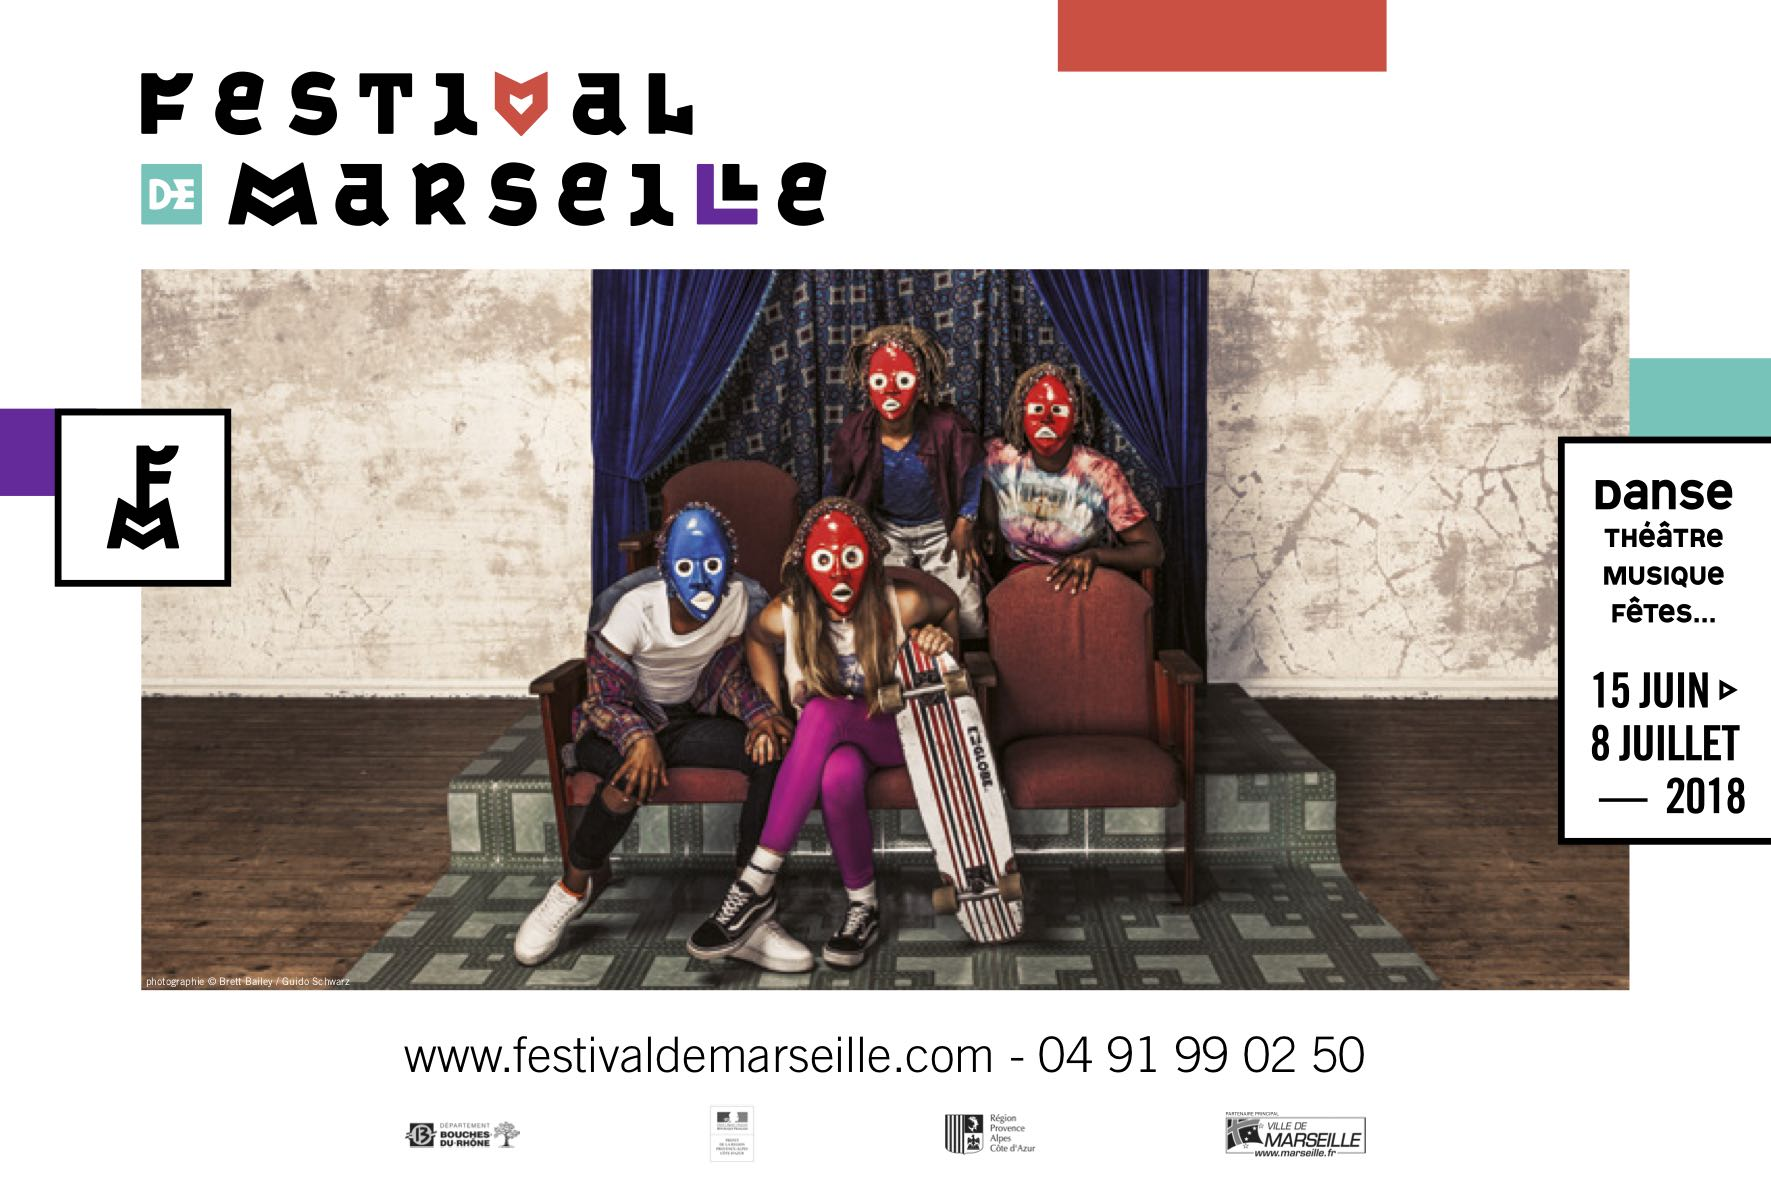 183453-festivaldemarseille2018_horizontal_72dpi_brett_bailey-guido_schwartz-1